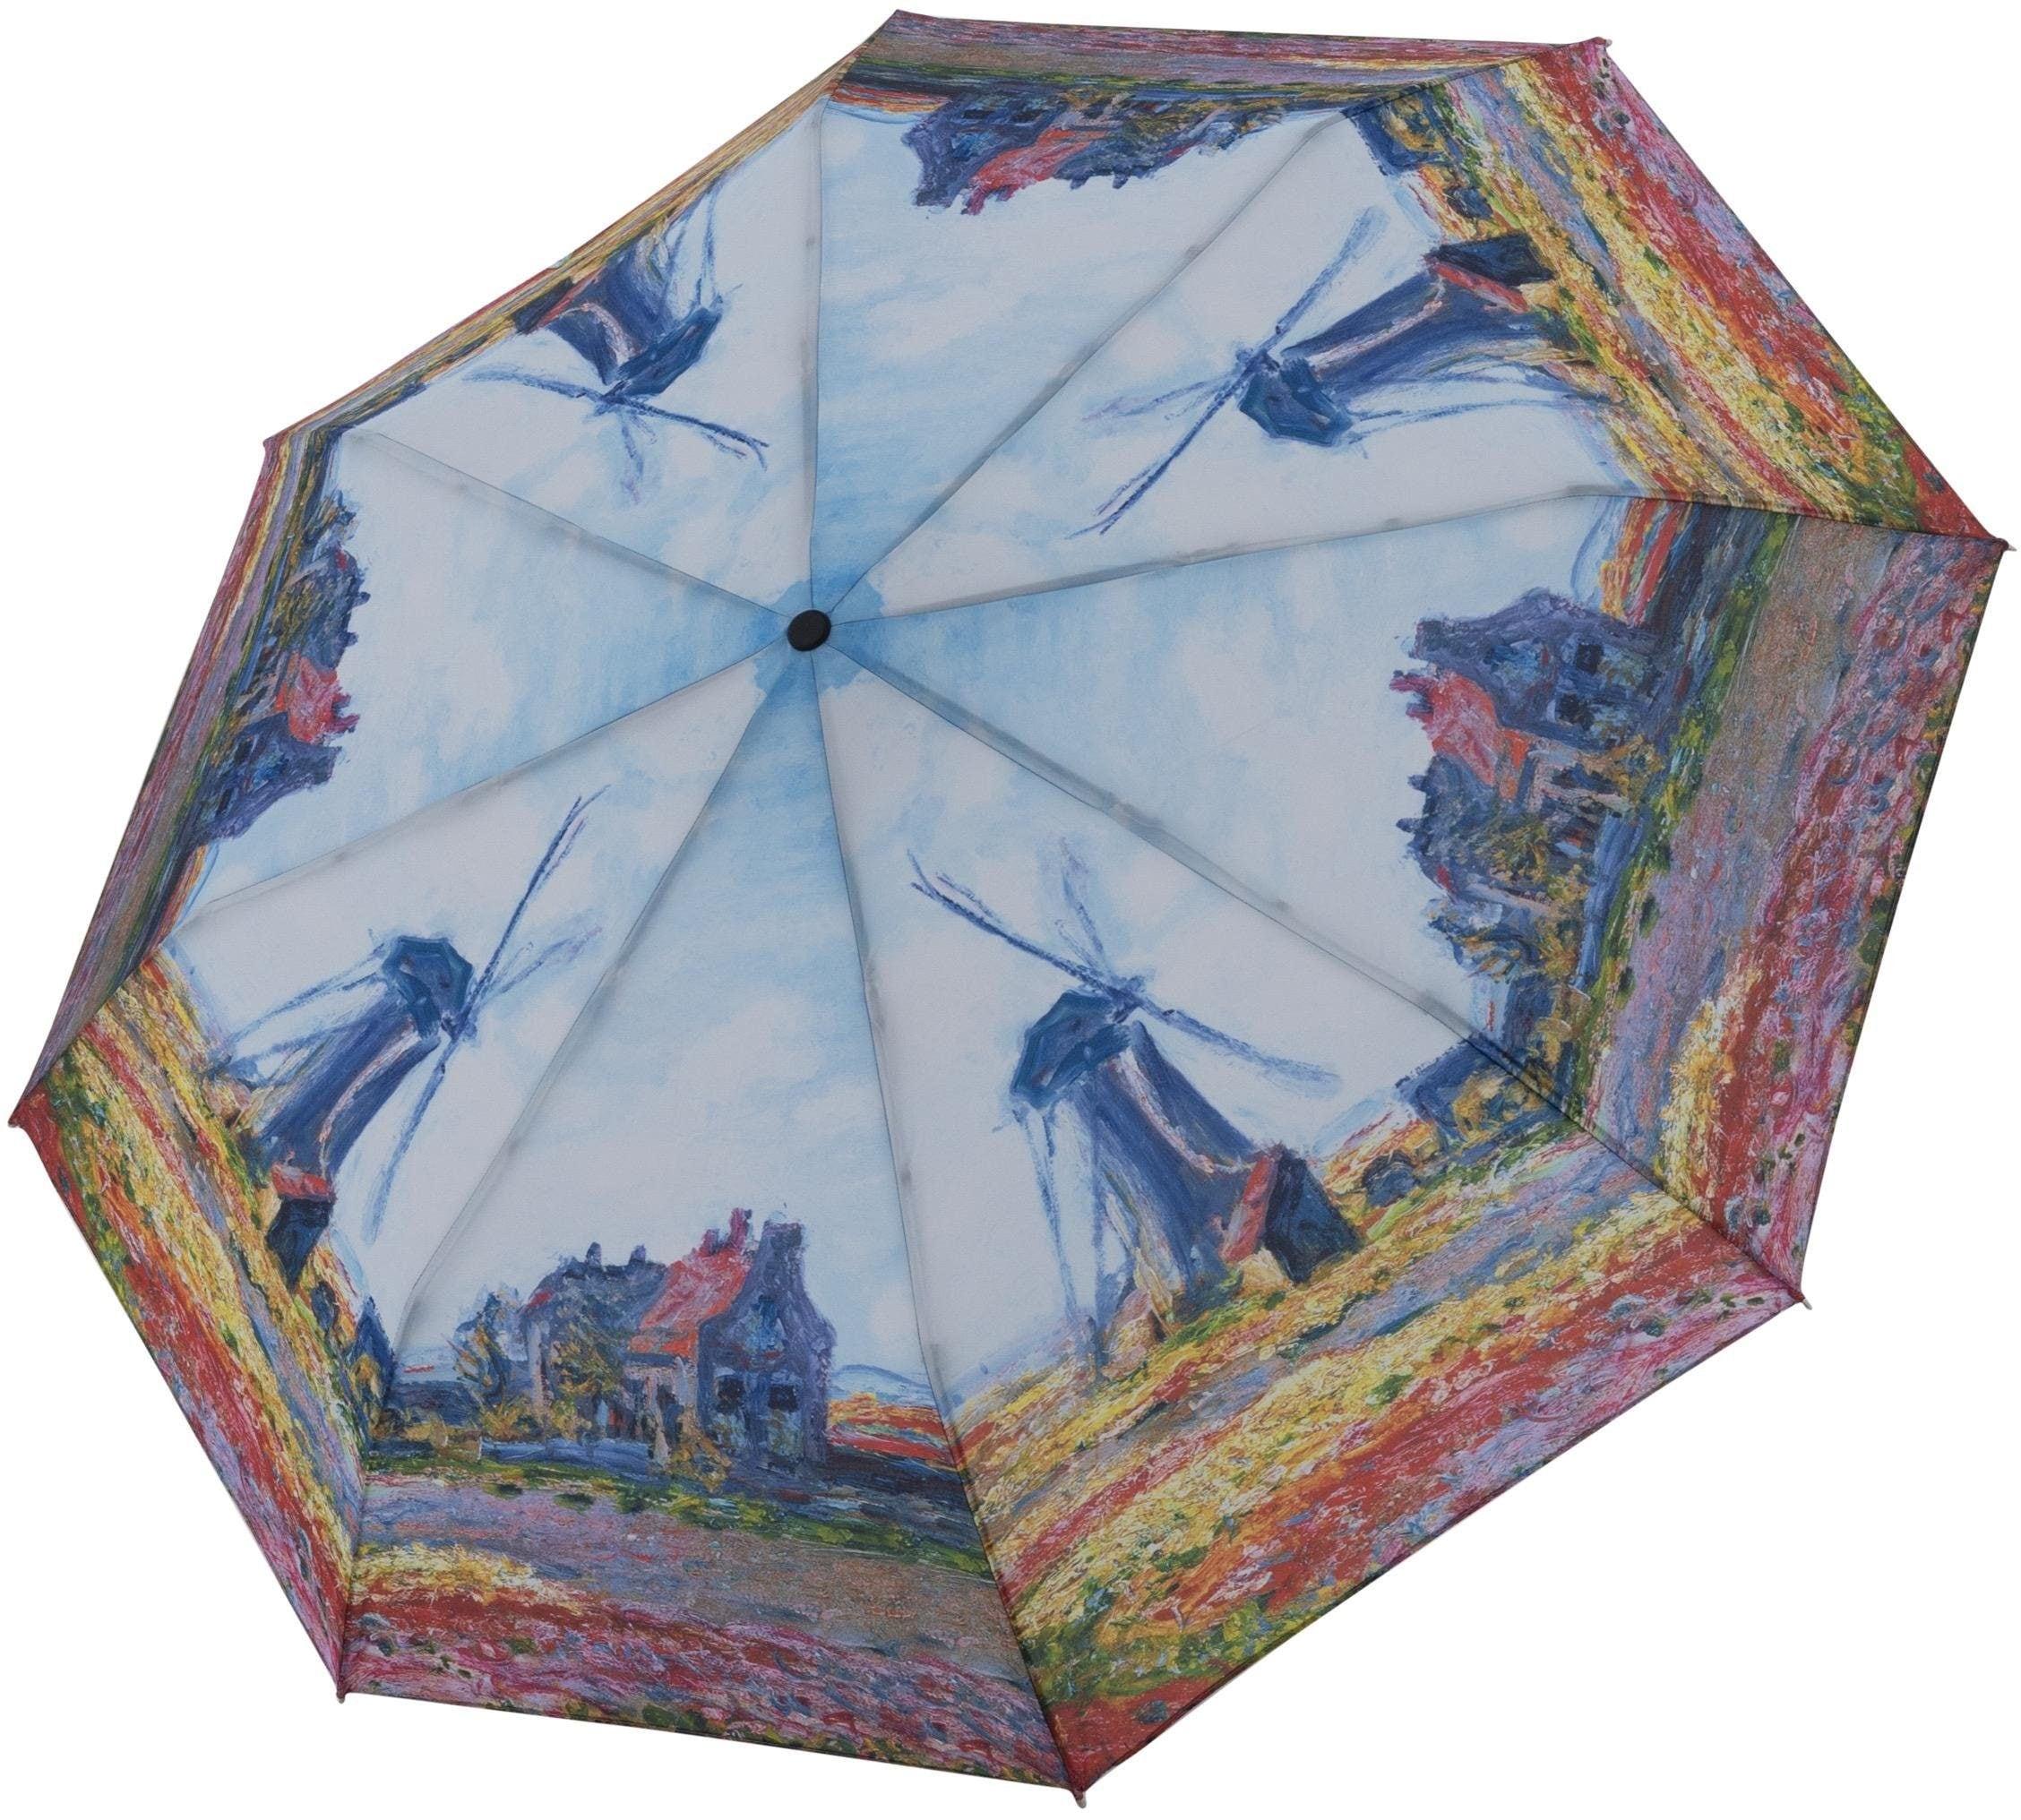 "doppler Taschenregenschirm ""Art Collection Magic Monet Windmühle"" Damenmode/Schmuck & Accessoires/Accessoires/Regenschirme/Taschenschirme"